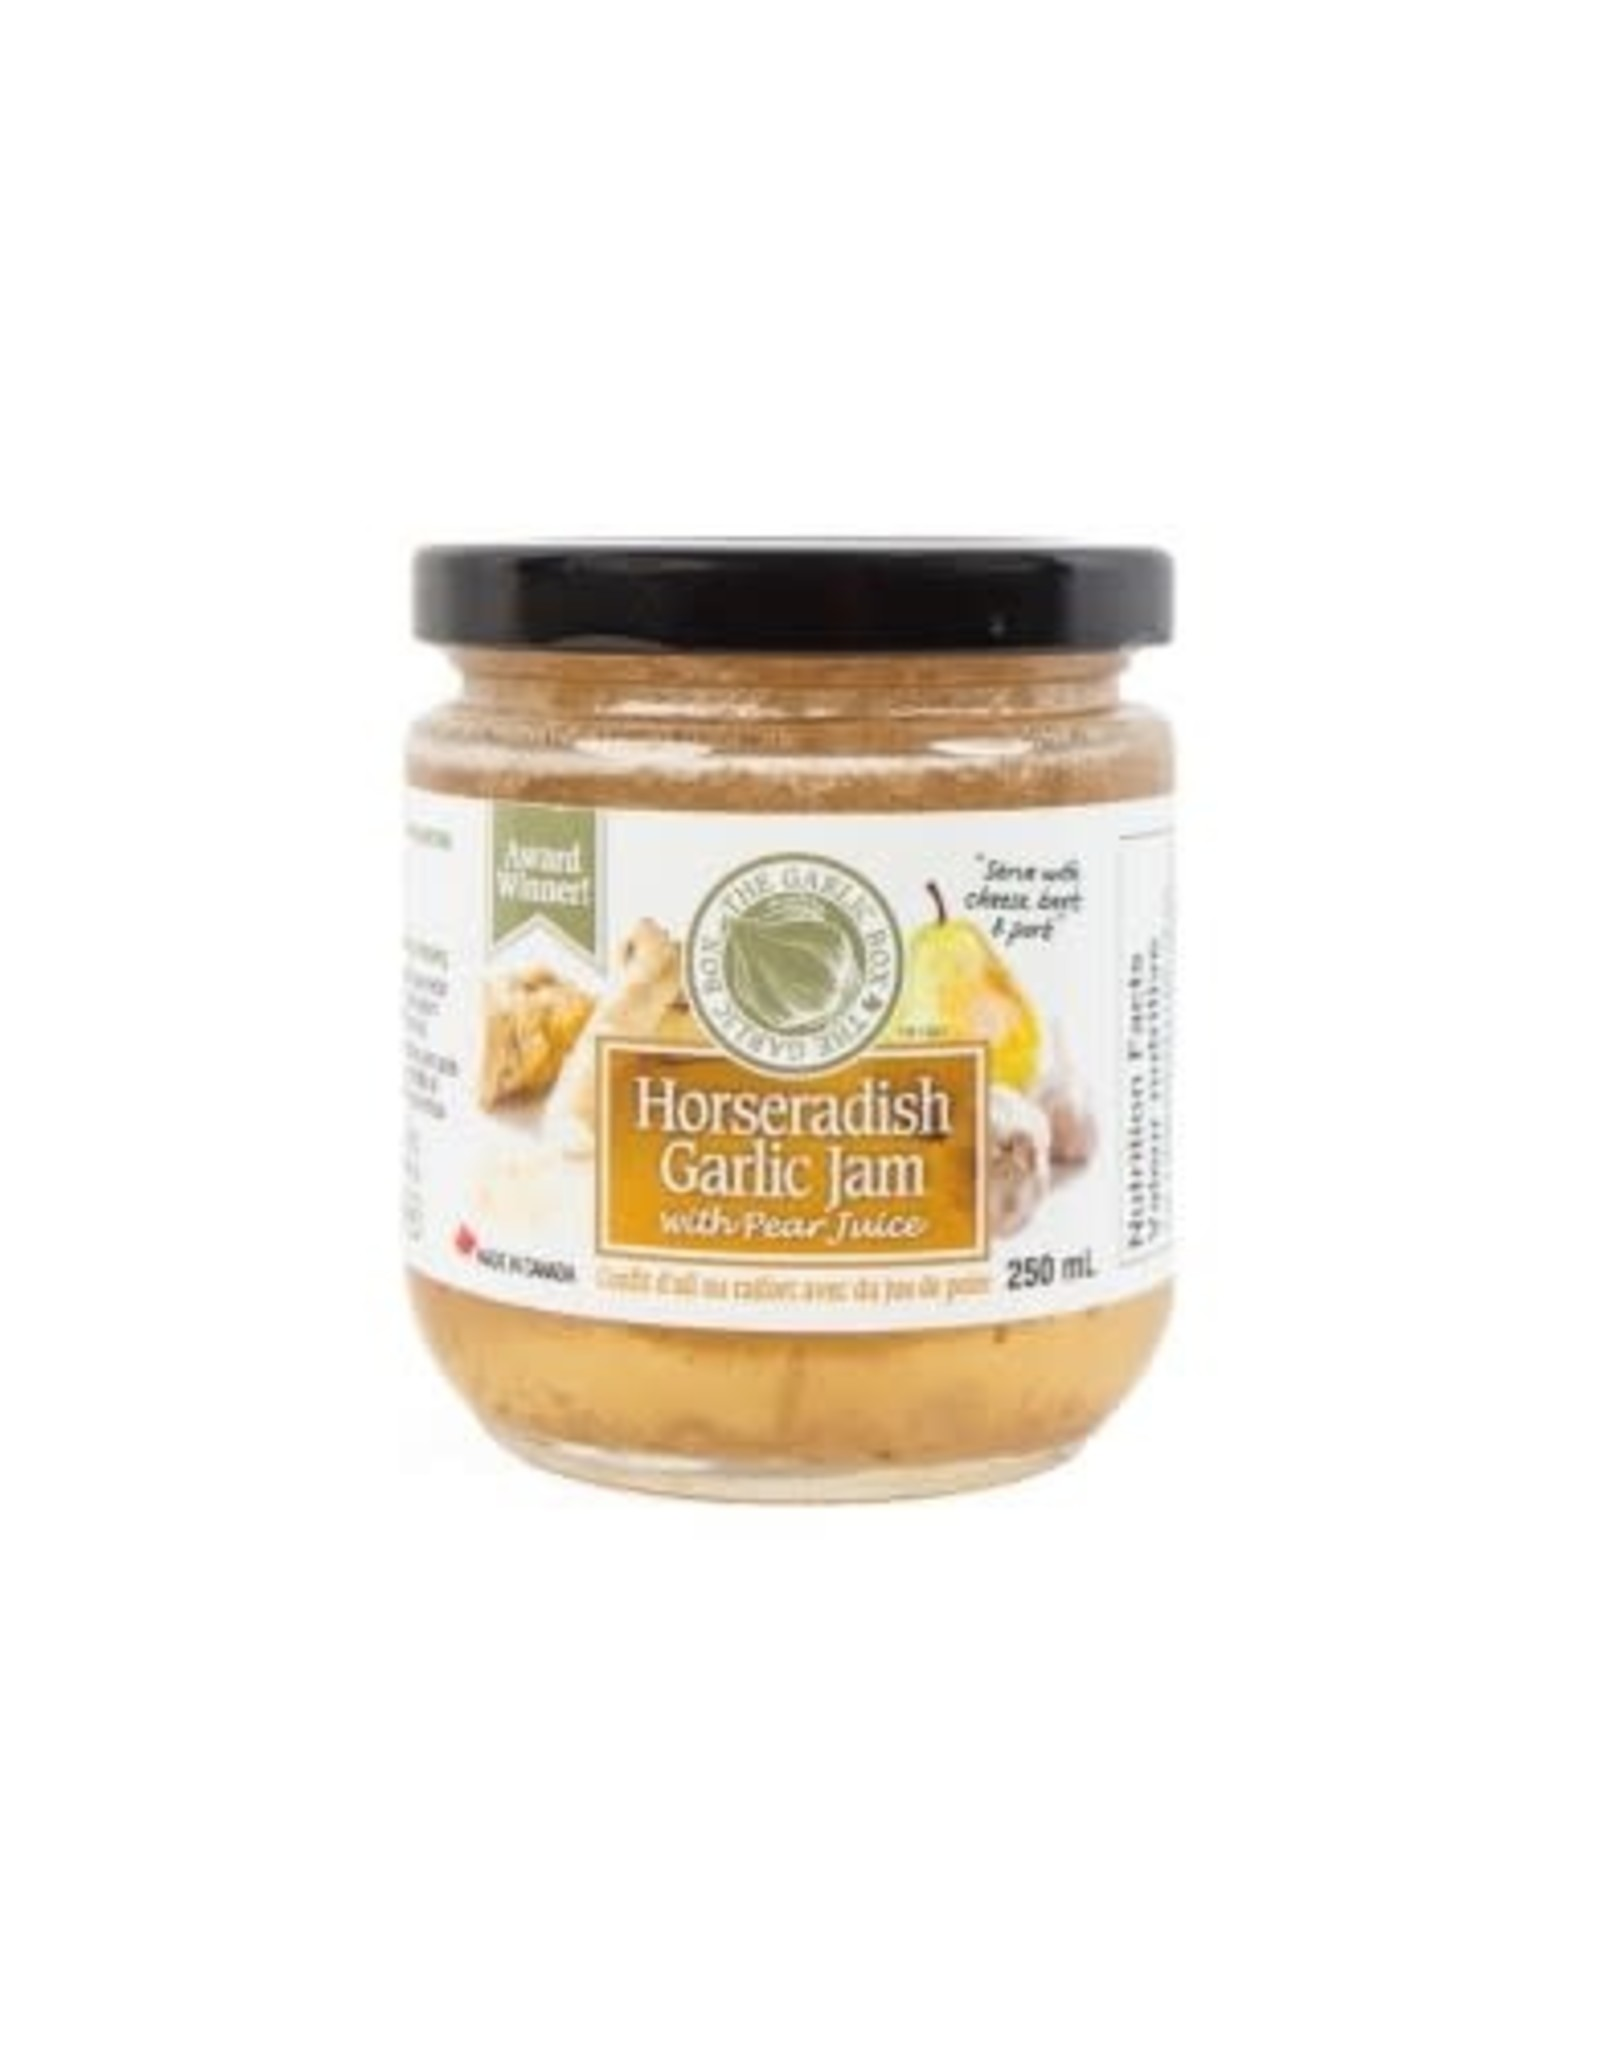 The Garlic Box Horseradish Garlic Jam with Pear Juice